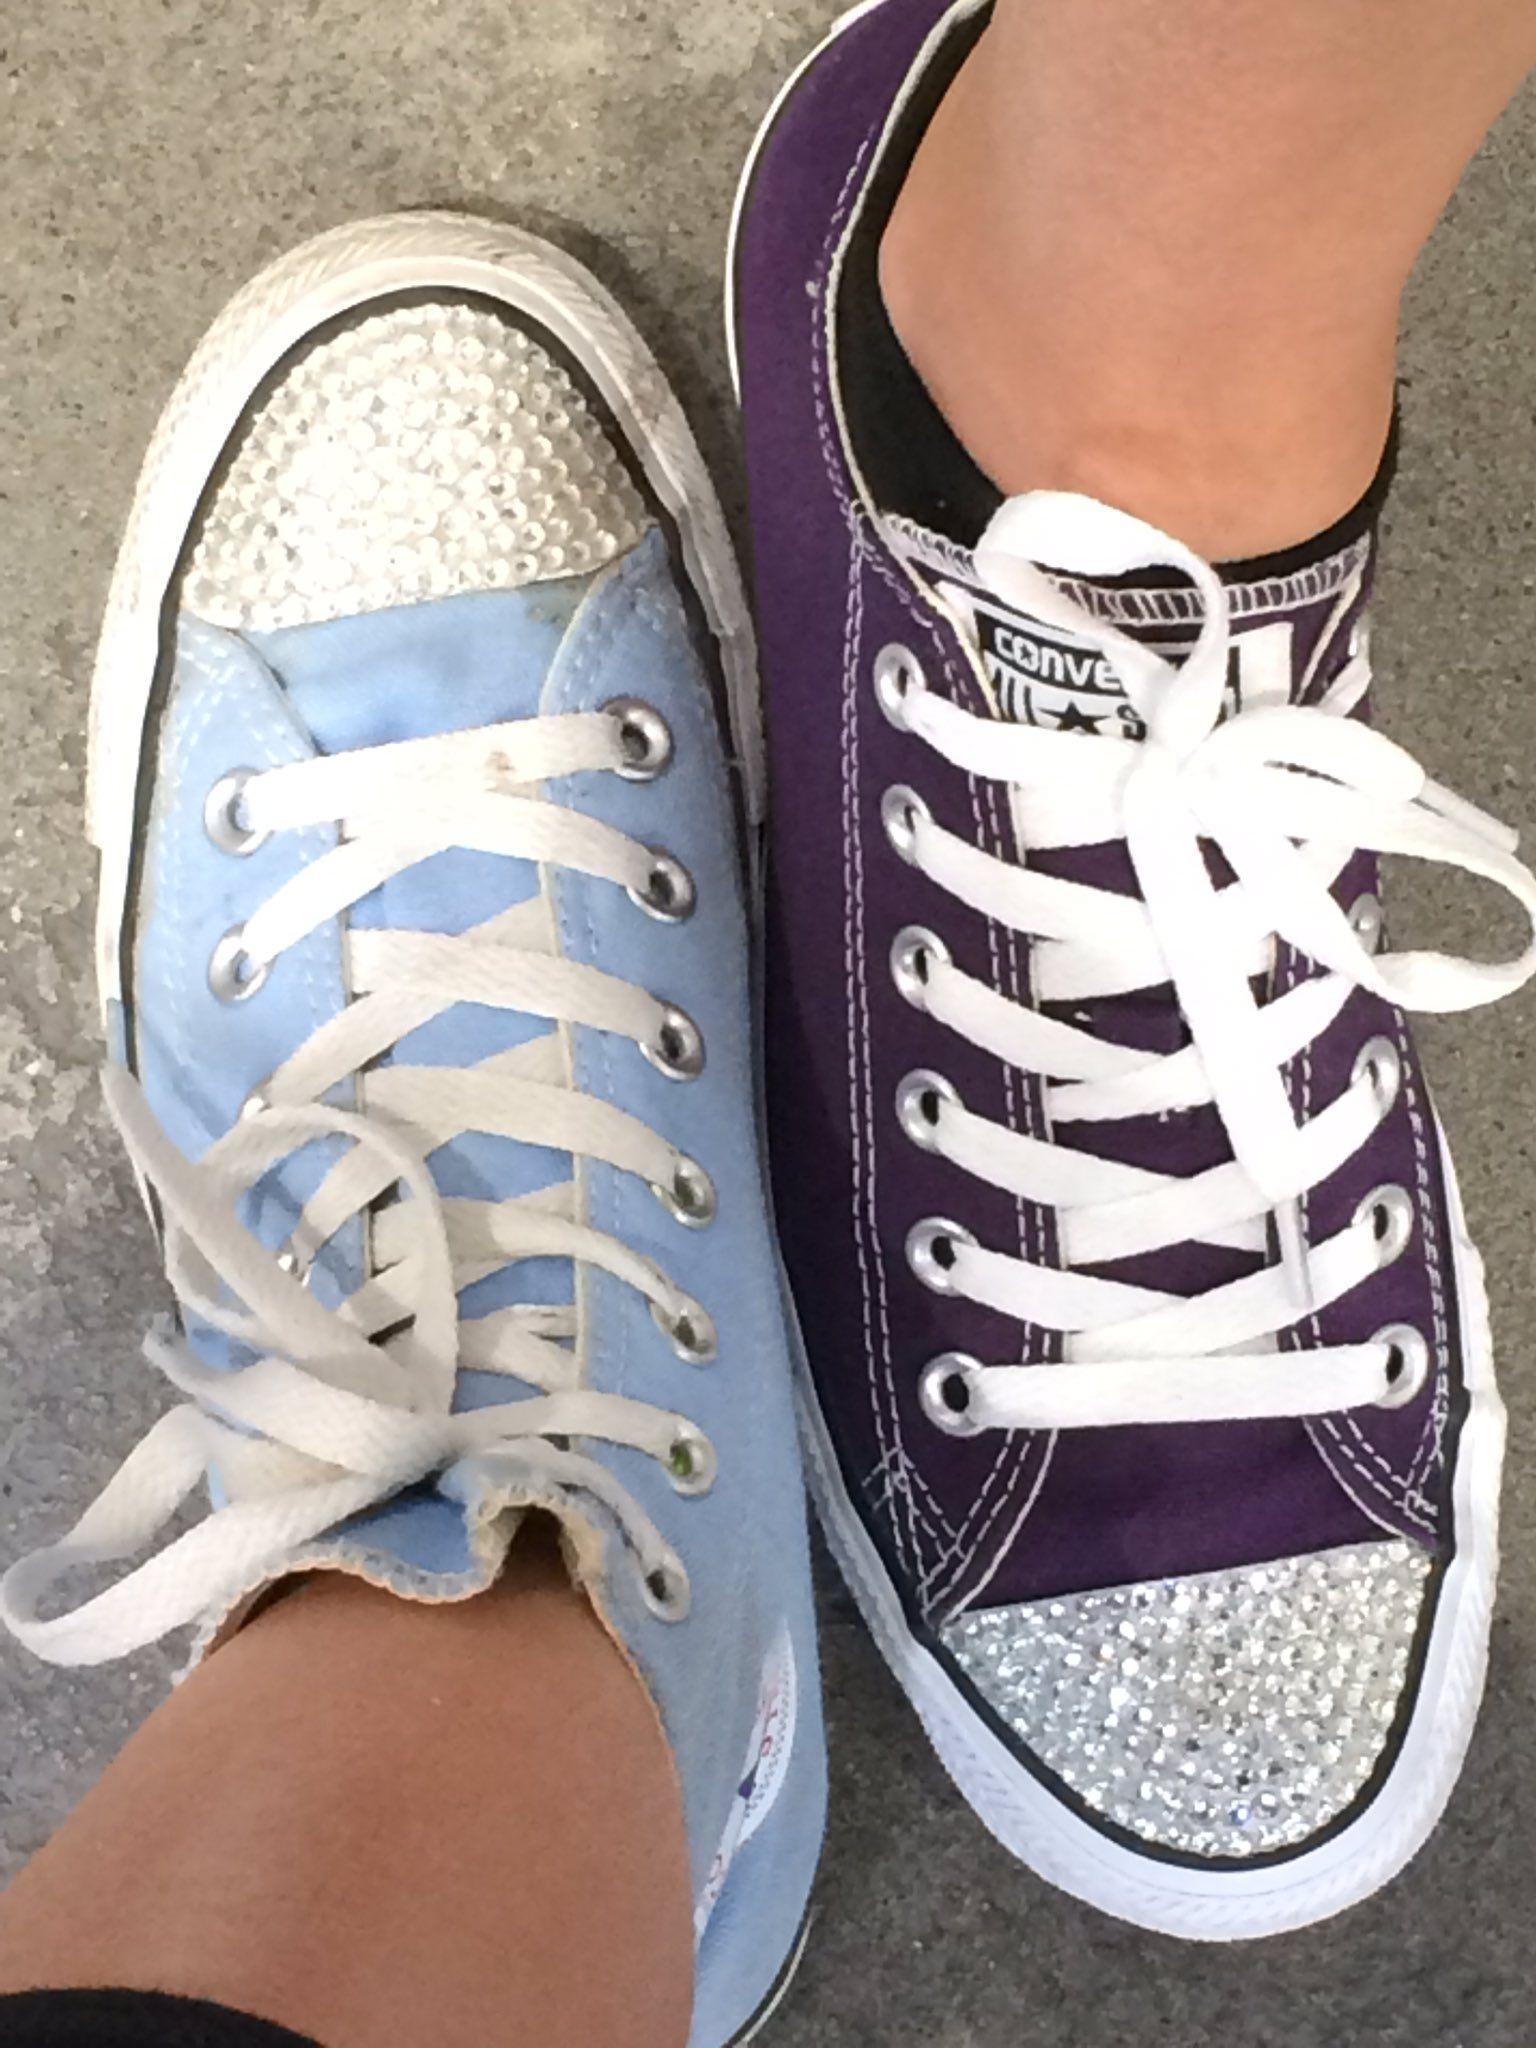 Custom Converse Shoes. Custom Made Converse Shoes. Converse Blinged Shoes & Custom Converse Shoes. Custom Made Converse Shoes. Converse Blinged ...